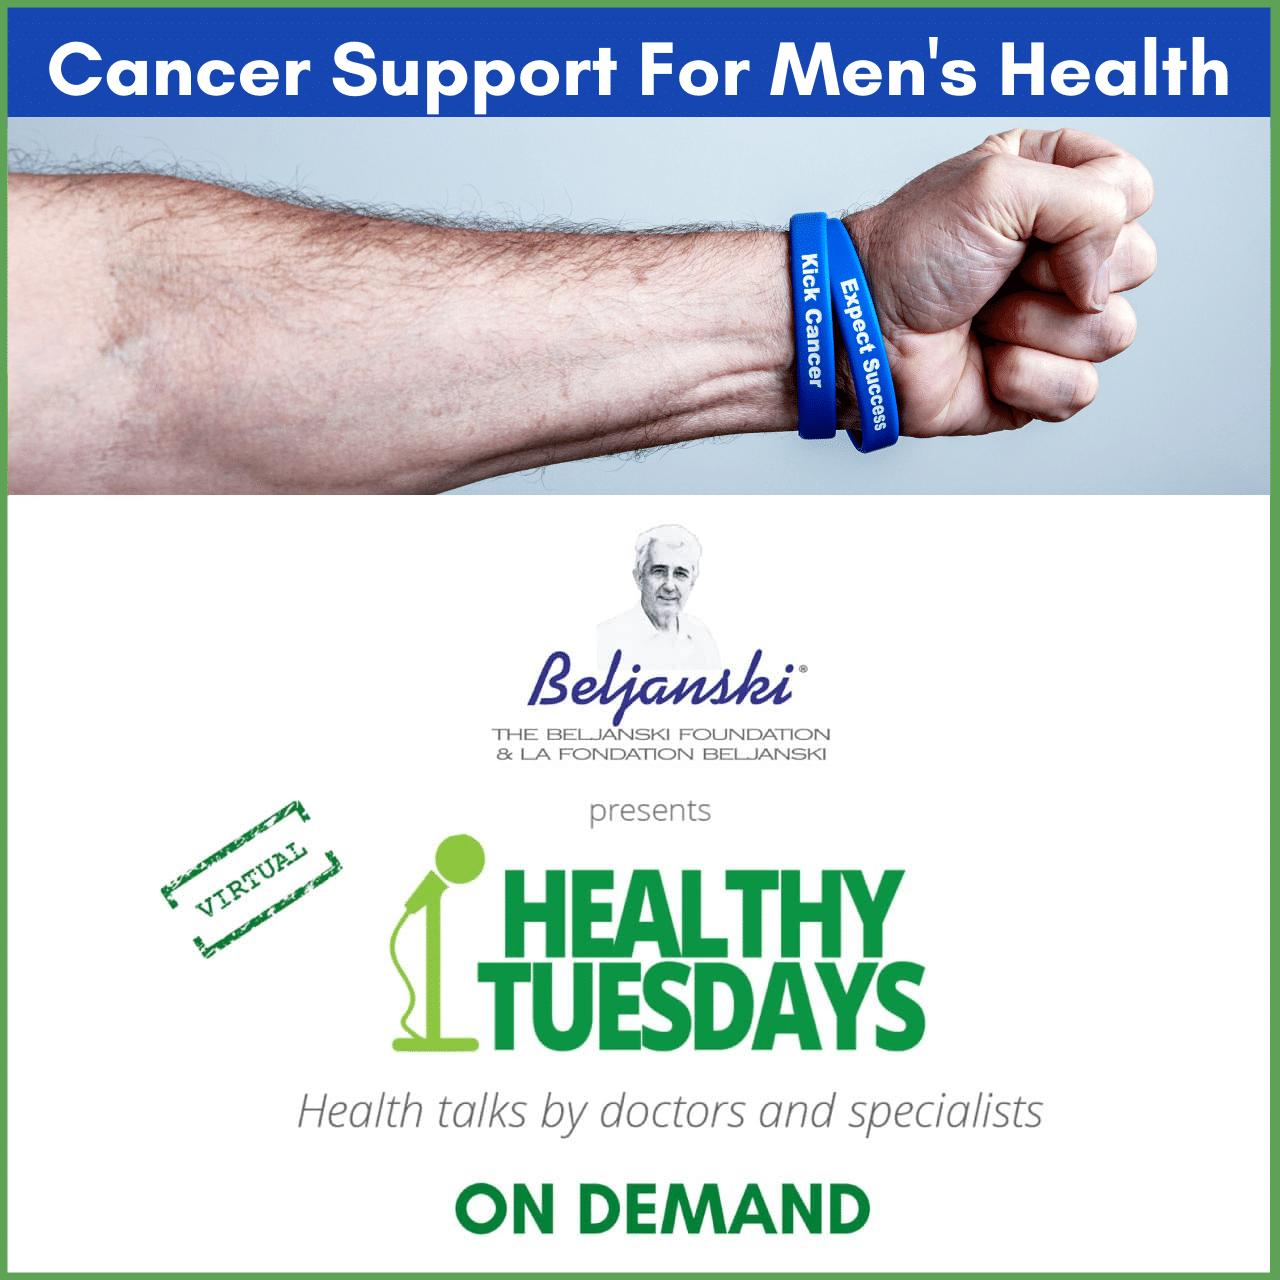 cancer support for men's health